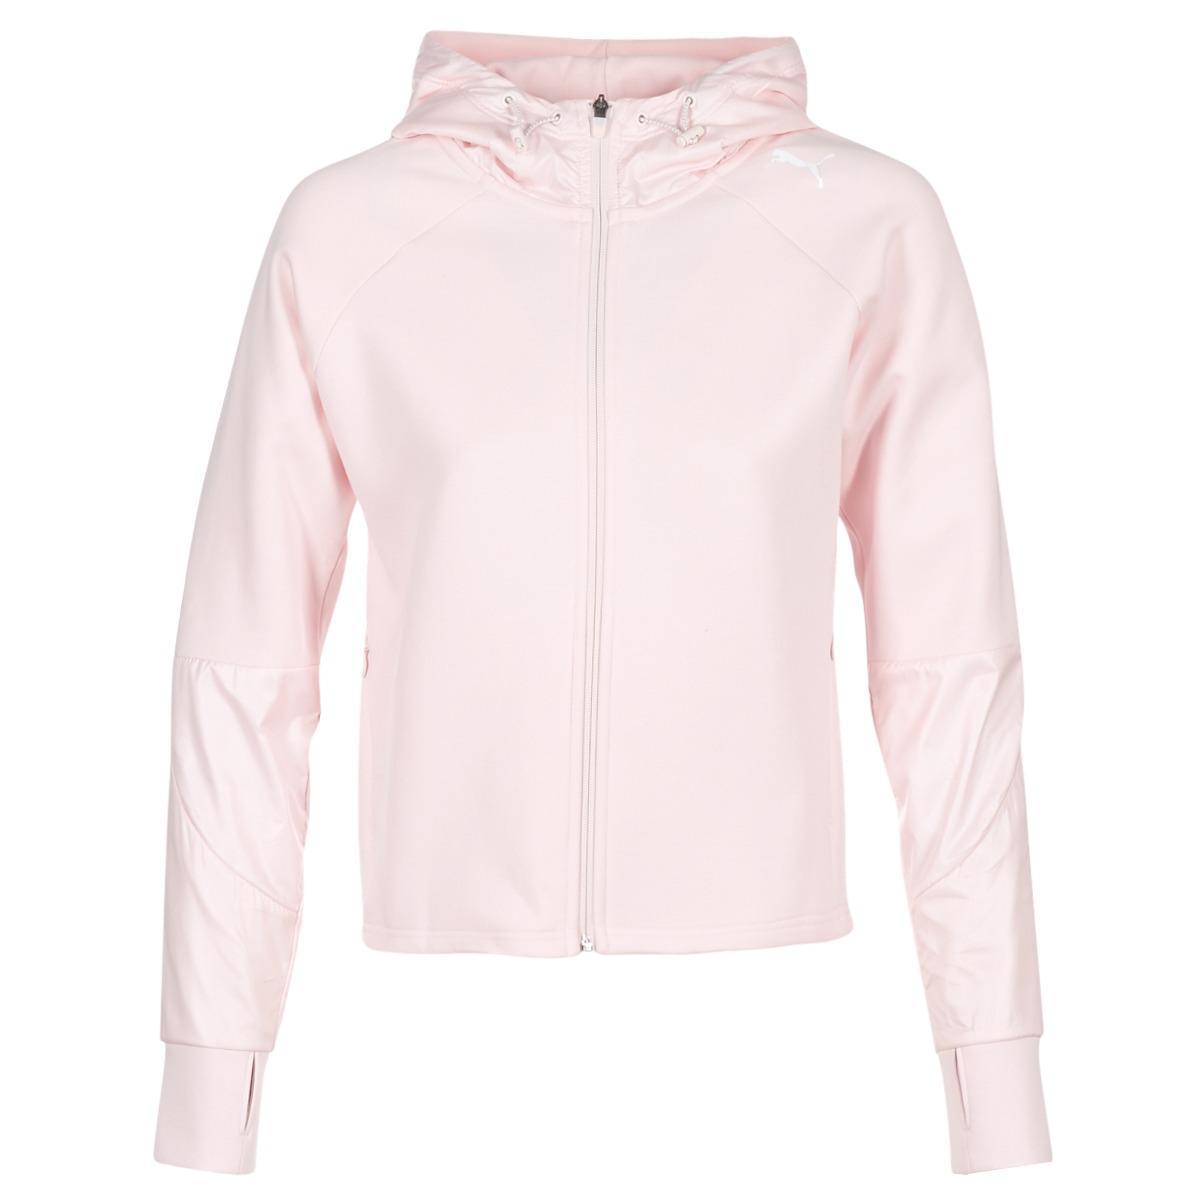 0b91c1d5be8e PUMA Evostripe Fz Jacket Women s Sweatshirt In Pink in Pink - Lyst